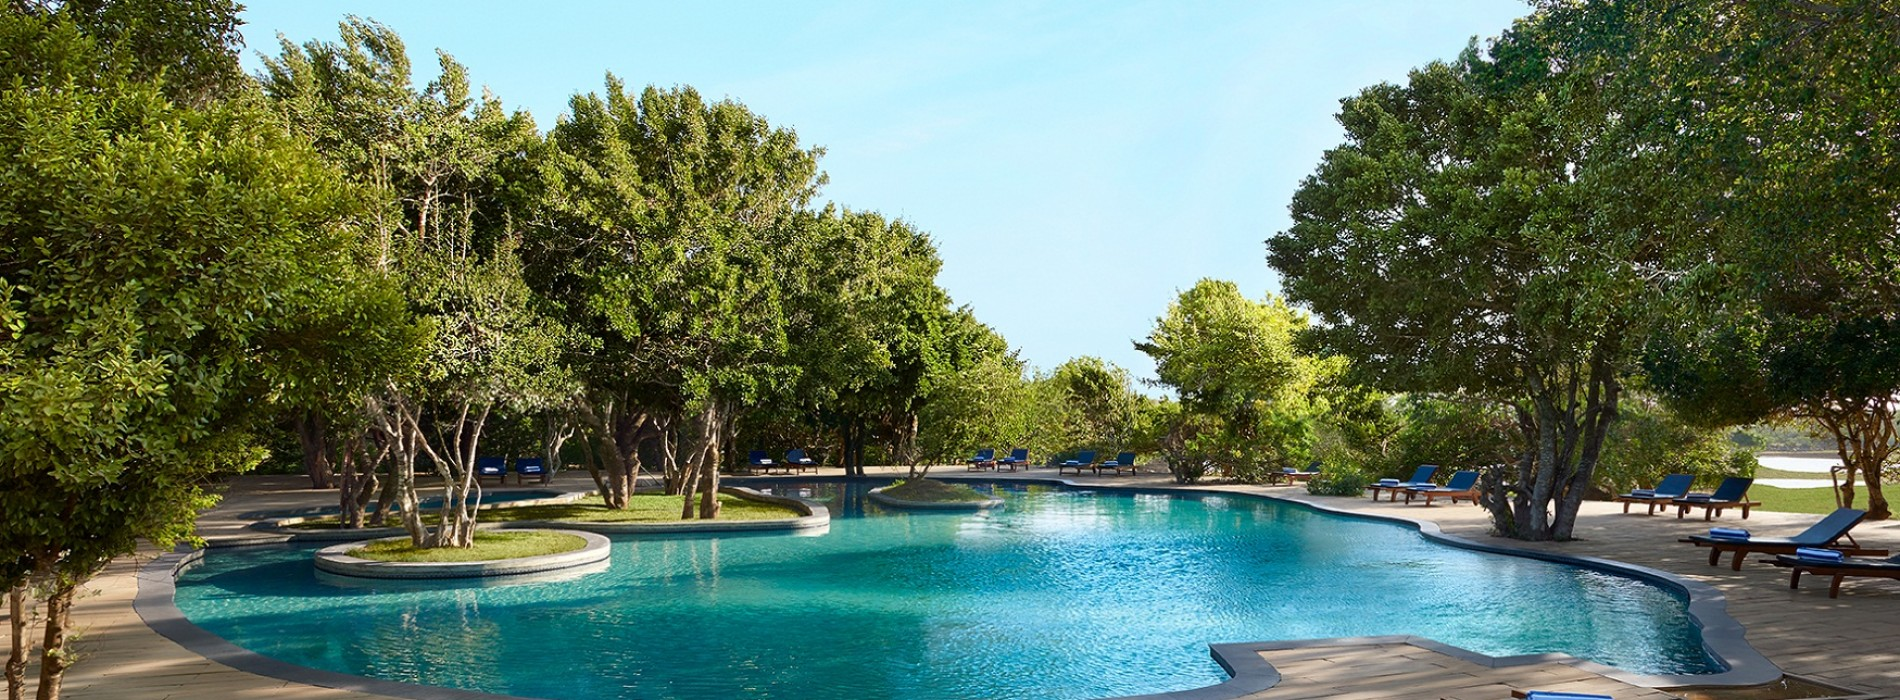 Cinnamon Hotels & Resorts offers unique experiential summer gateways in Sri Lanka